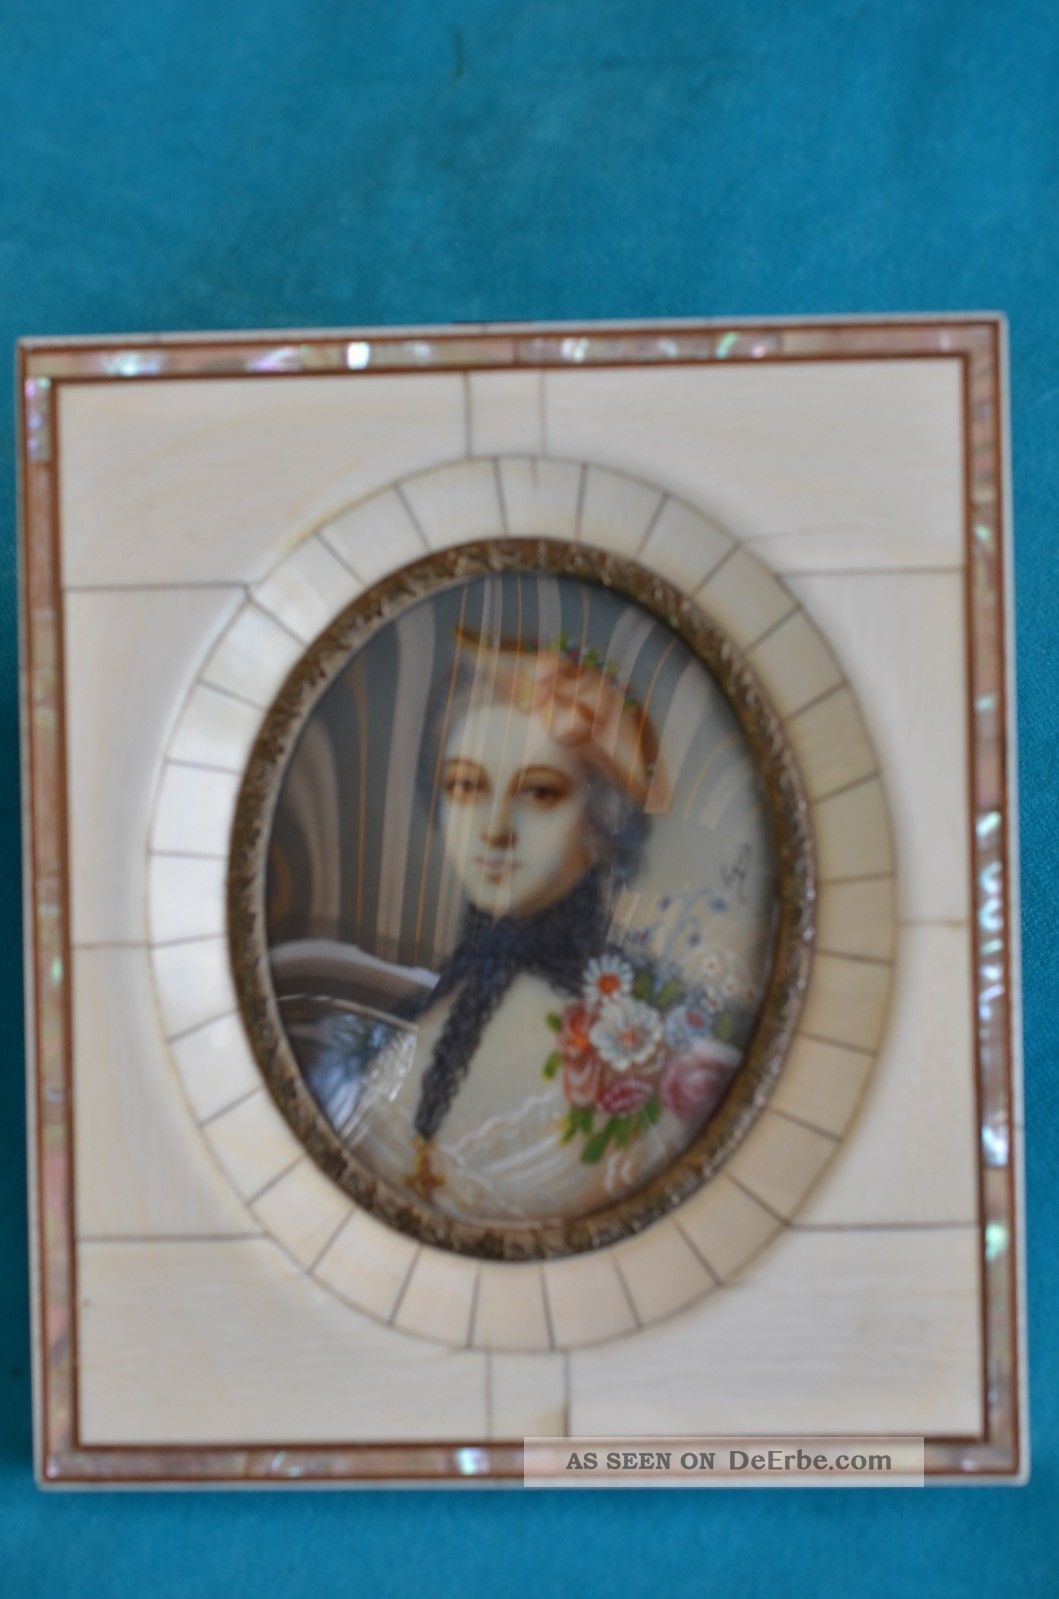 Alte Antike Lupenmalerei Miniaturmalerei Signiert Seguin Um 1860/1880 Miniaturen & Silhouetten Bild